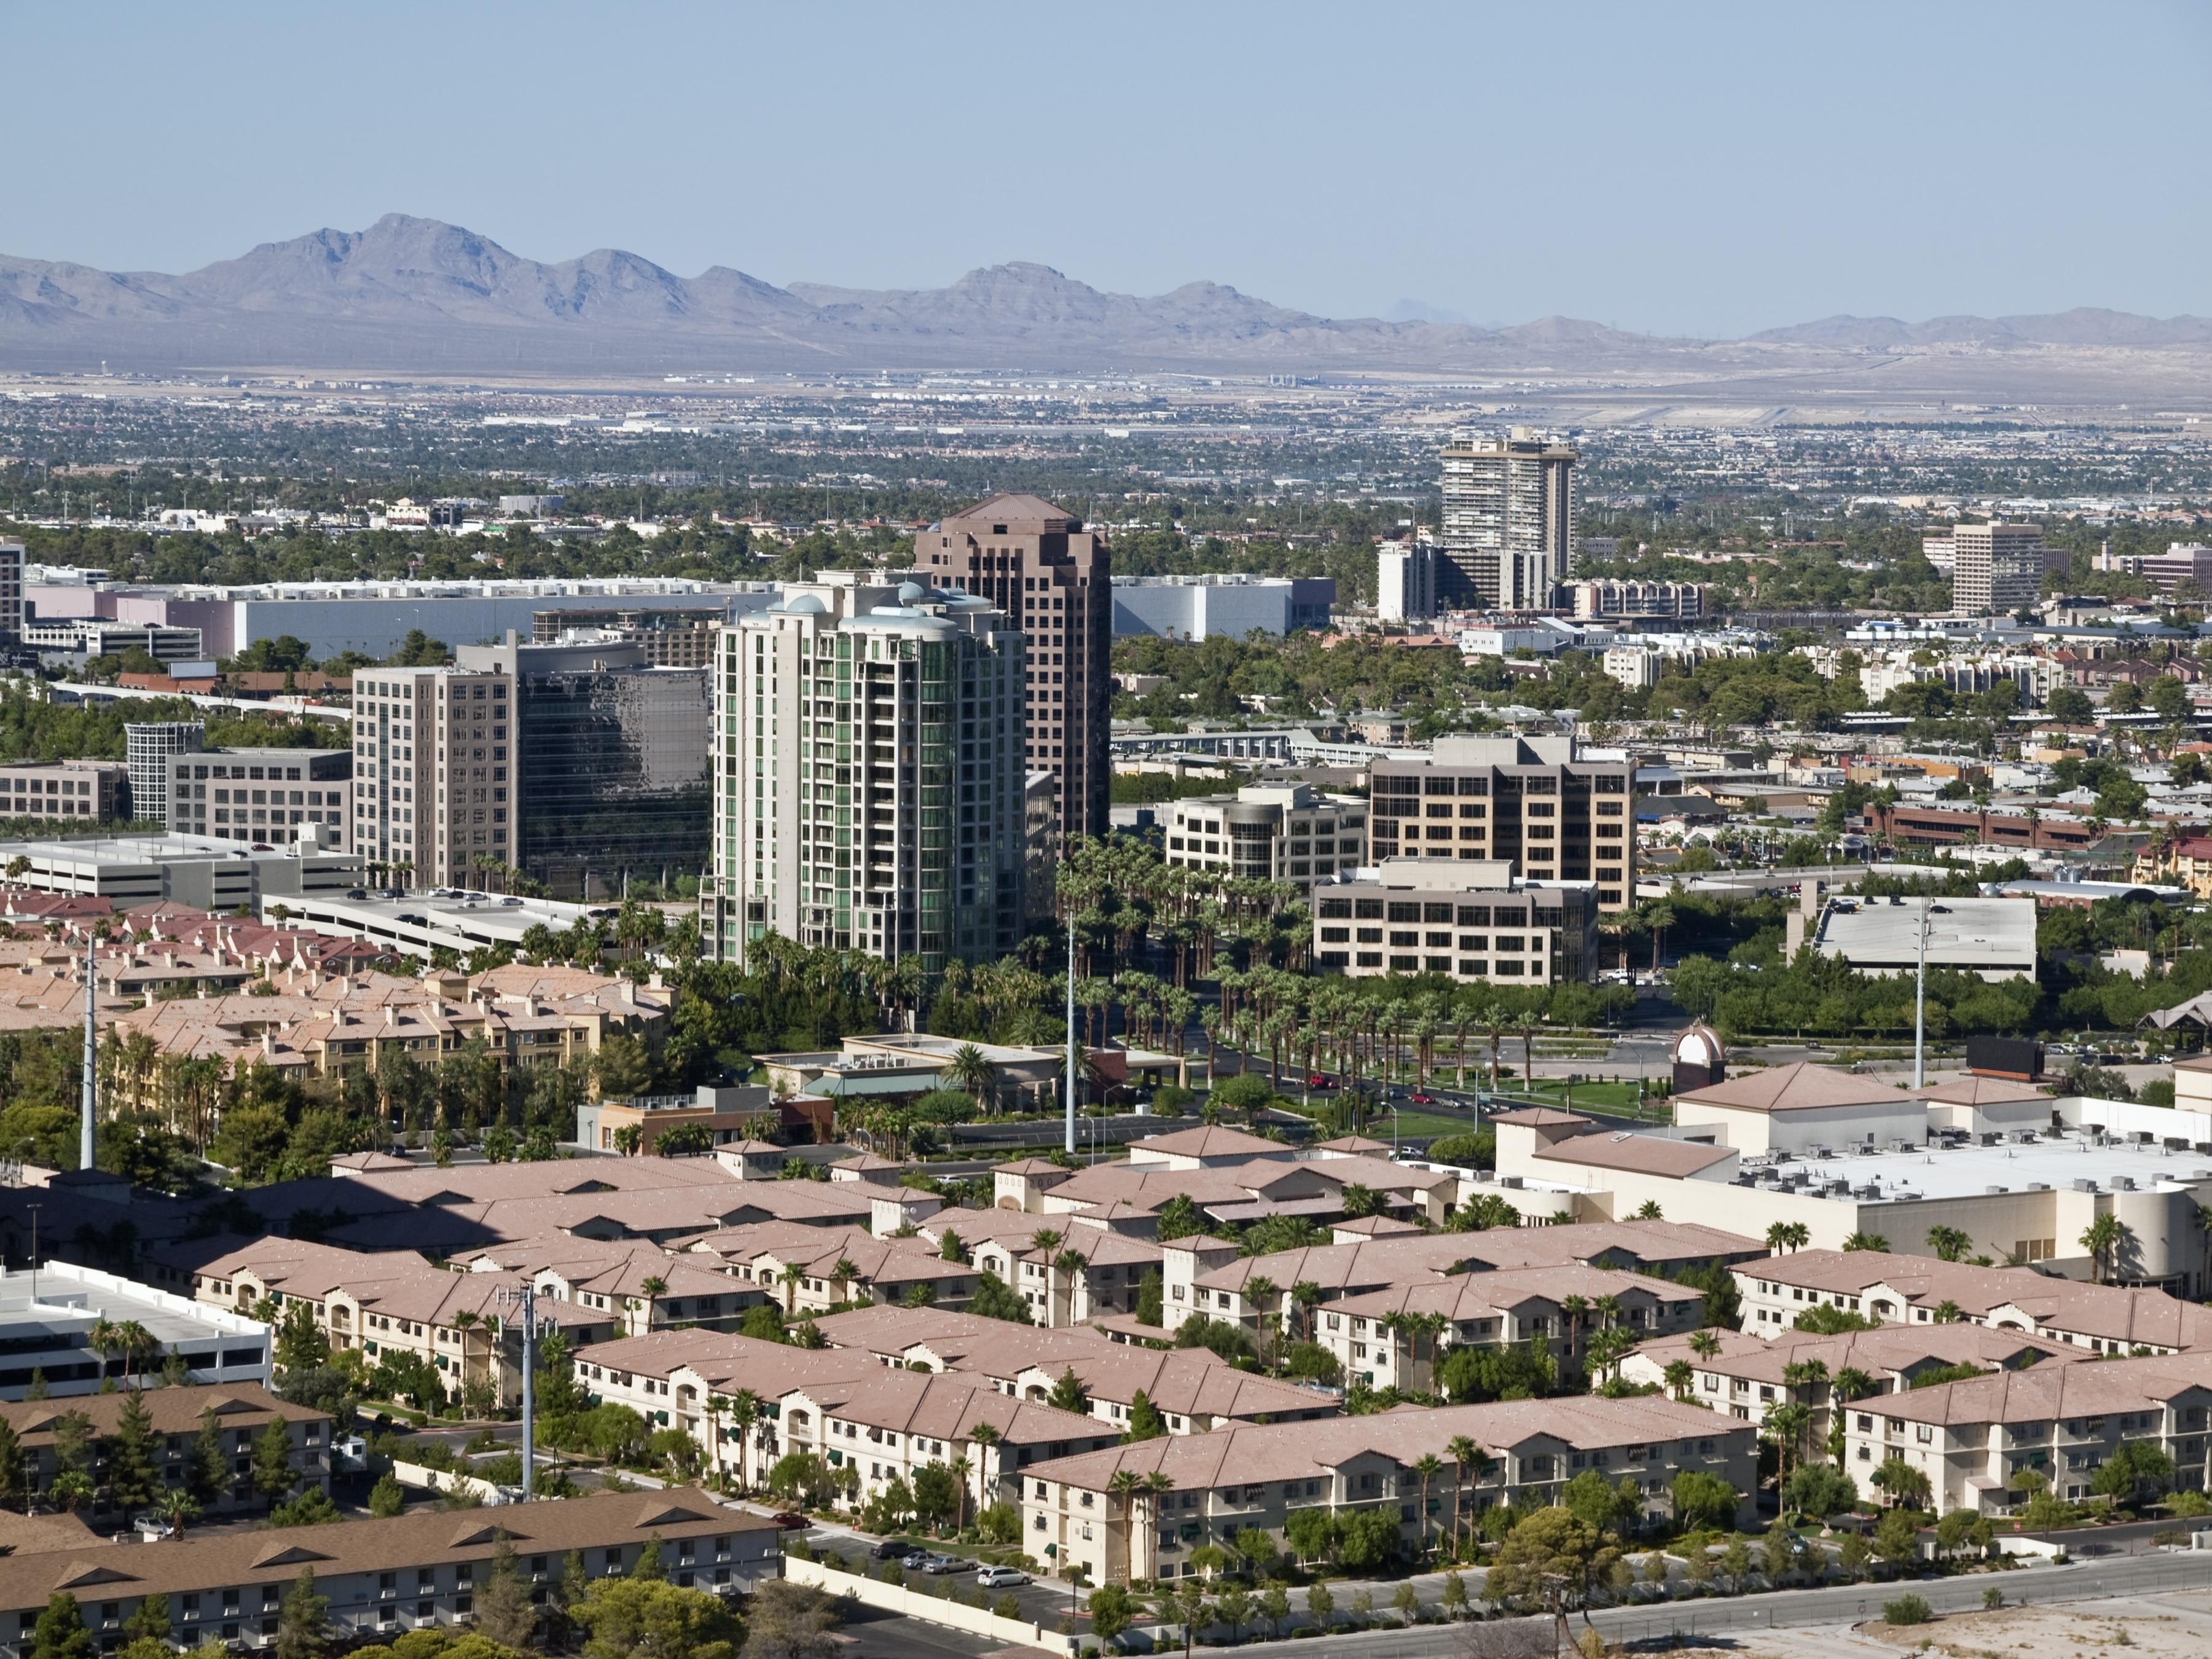 University of Nevada, Las Vegas, Las Vegas, Nevada, United States of America